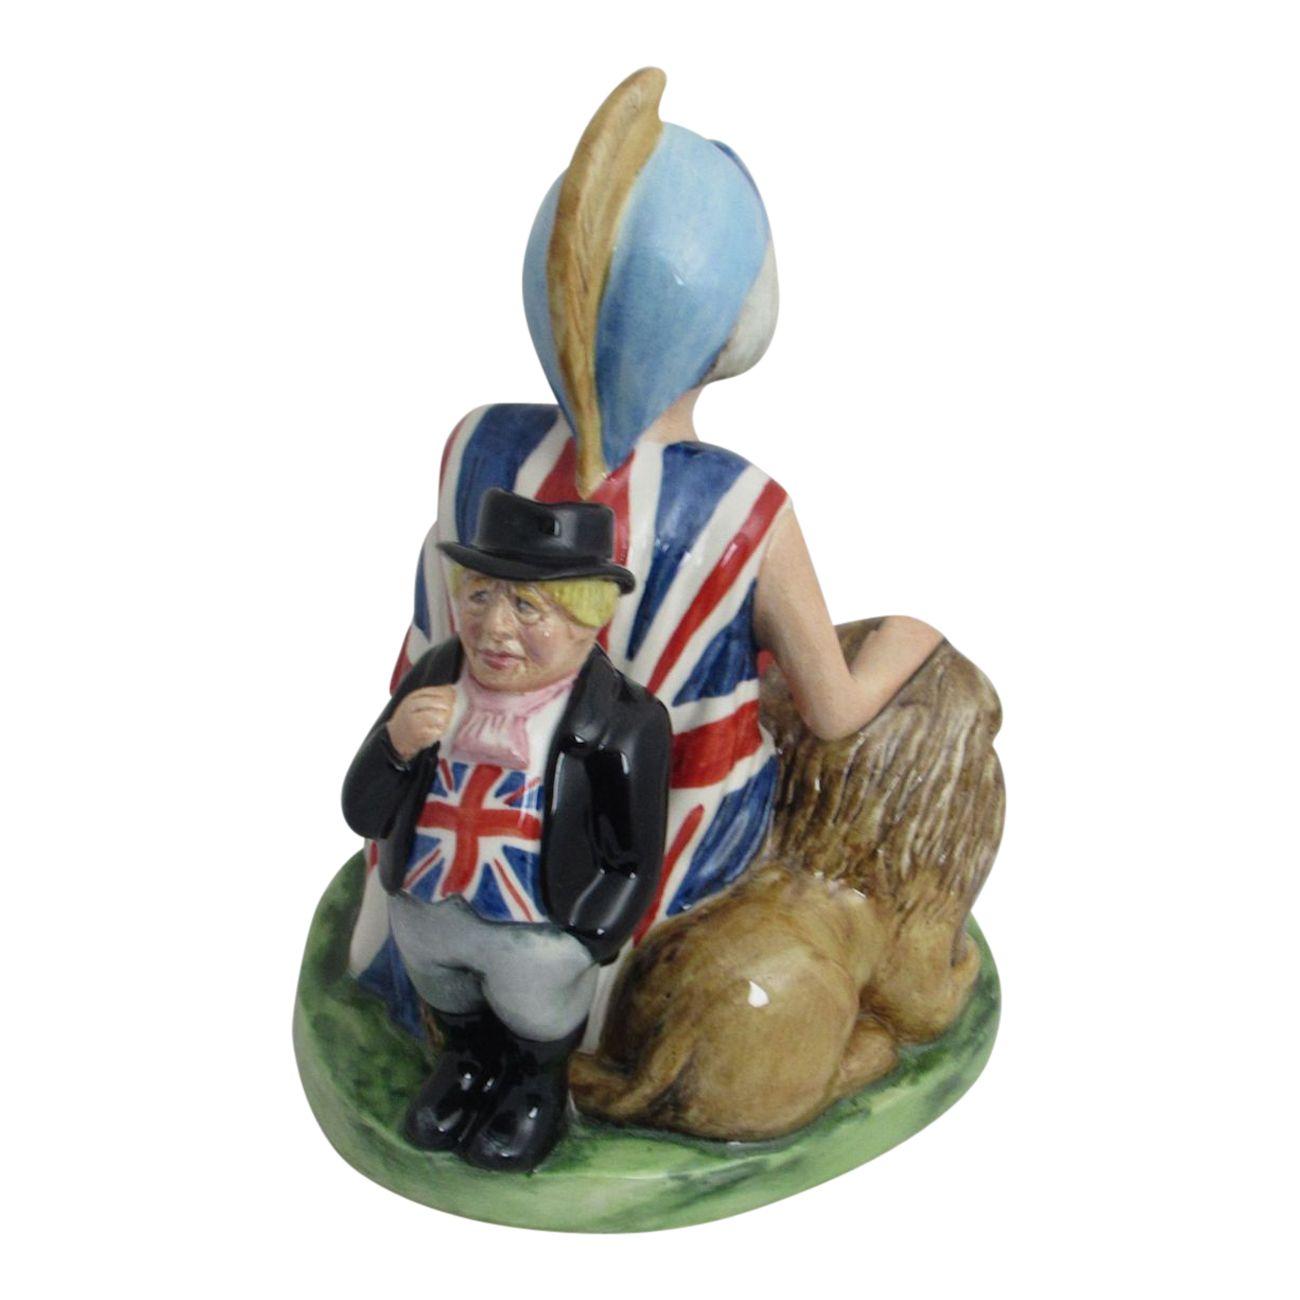 Bairstow Pottery Theresa May Brexitannia Figure Stoke